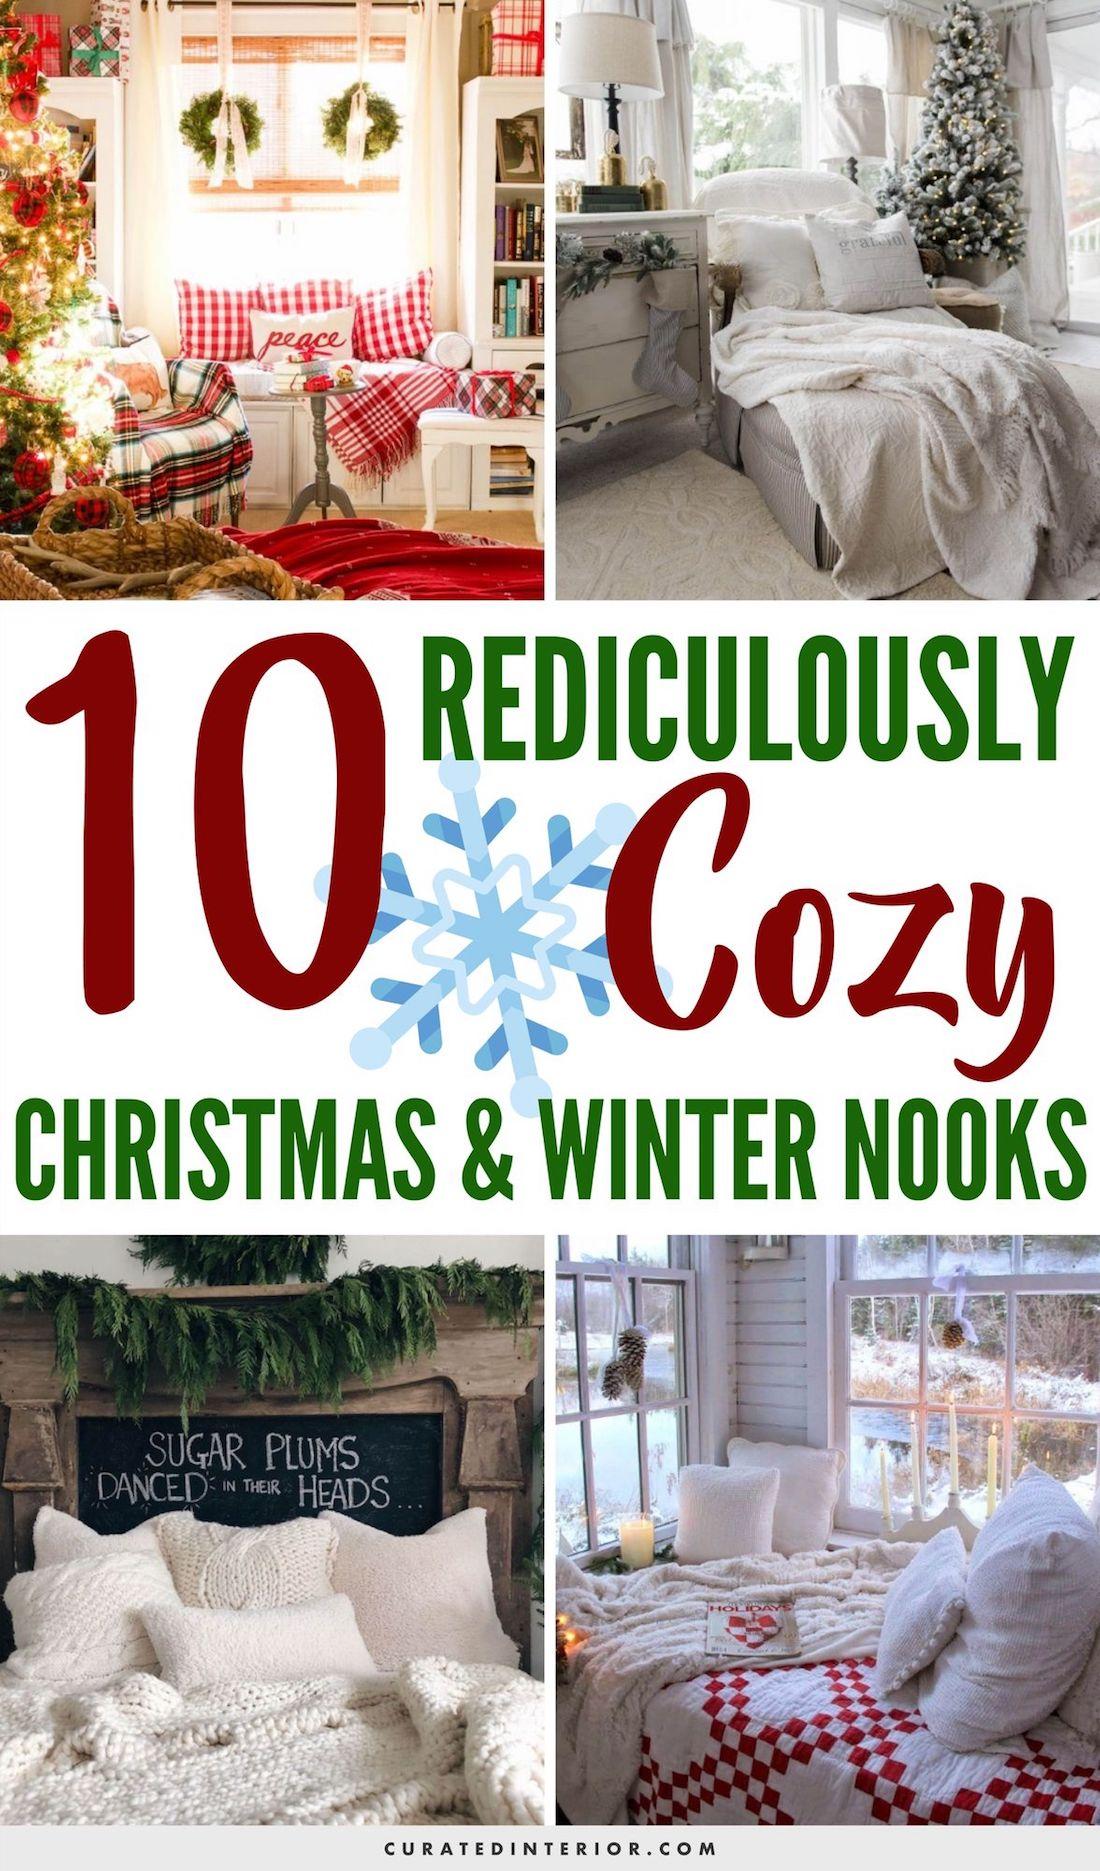 10 Rediculously Cozy Christmas & Winter Nooks #WinterDecor #WinterHome